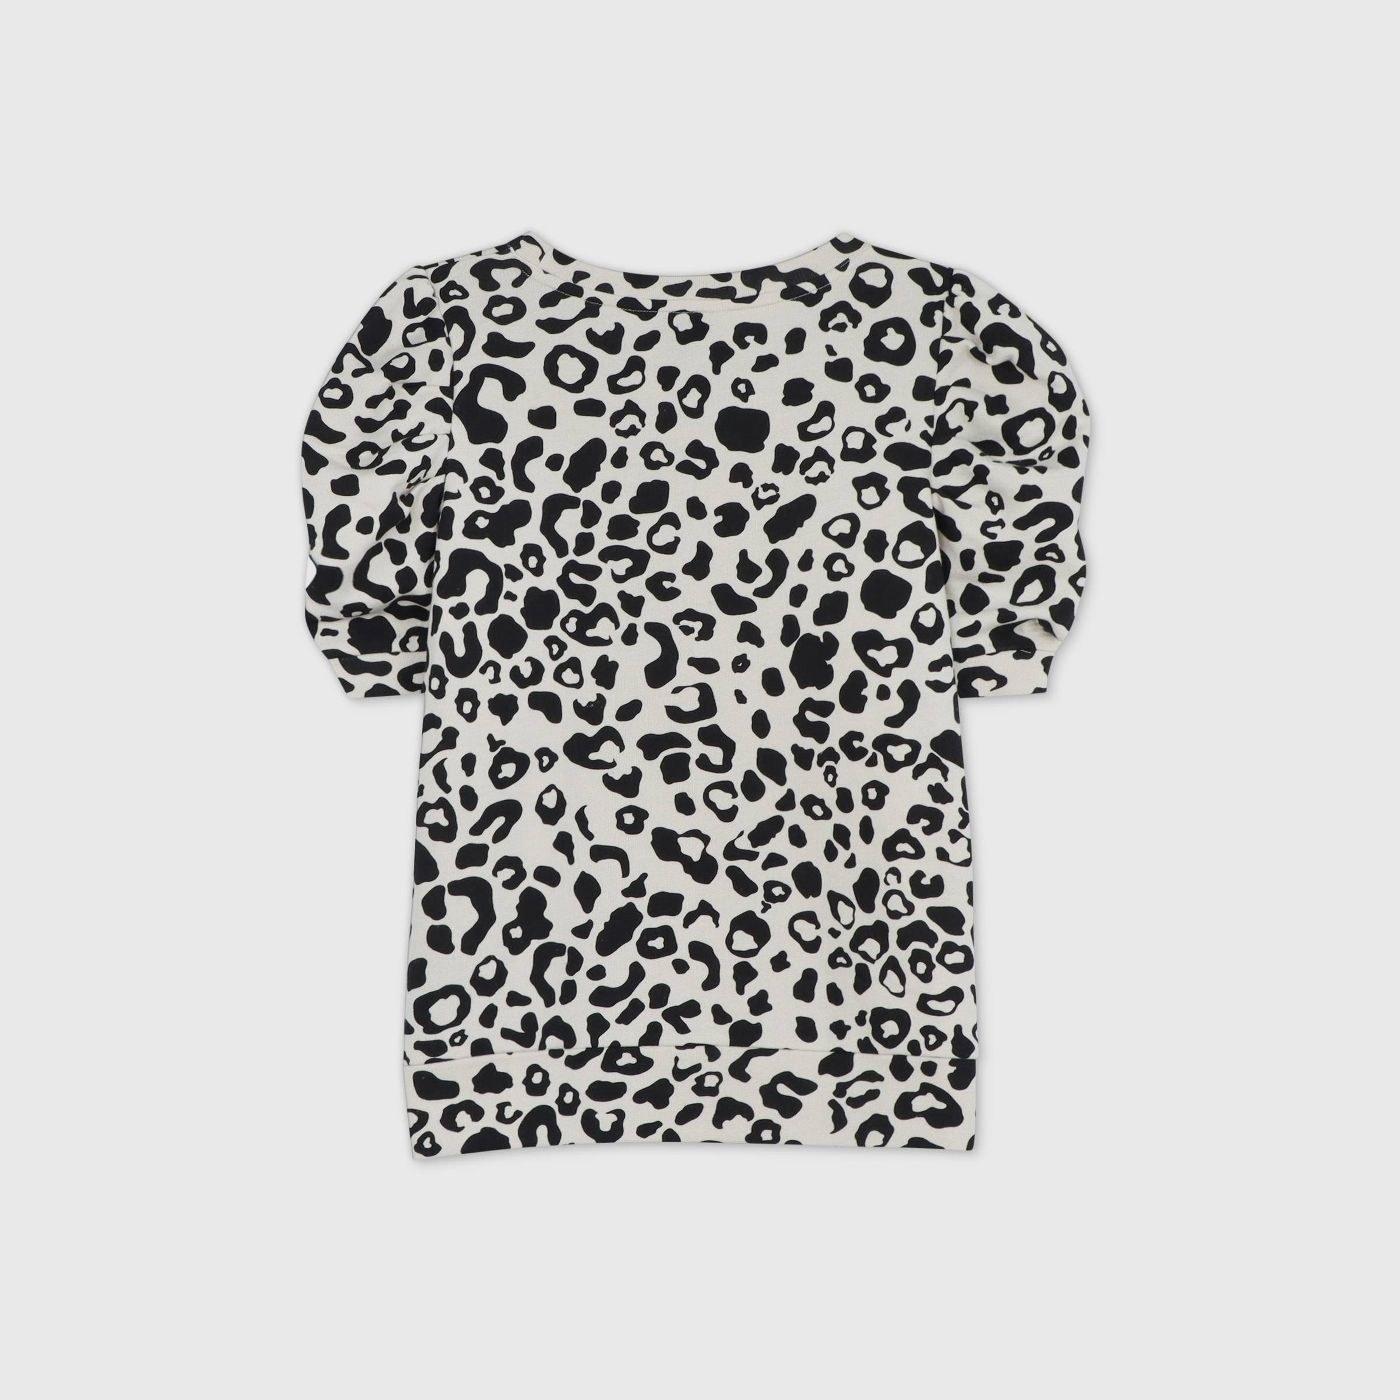 The leopard print sweatshirt